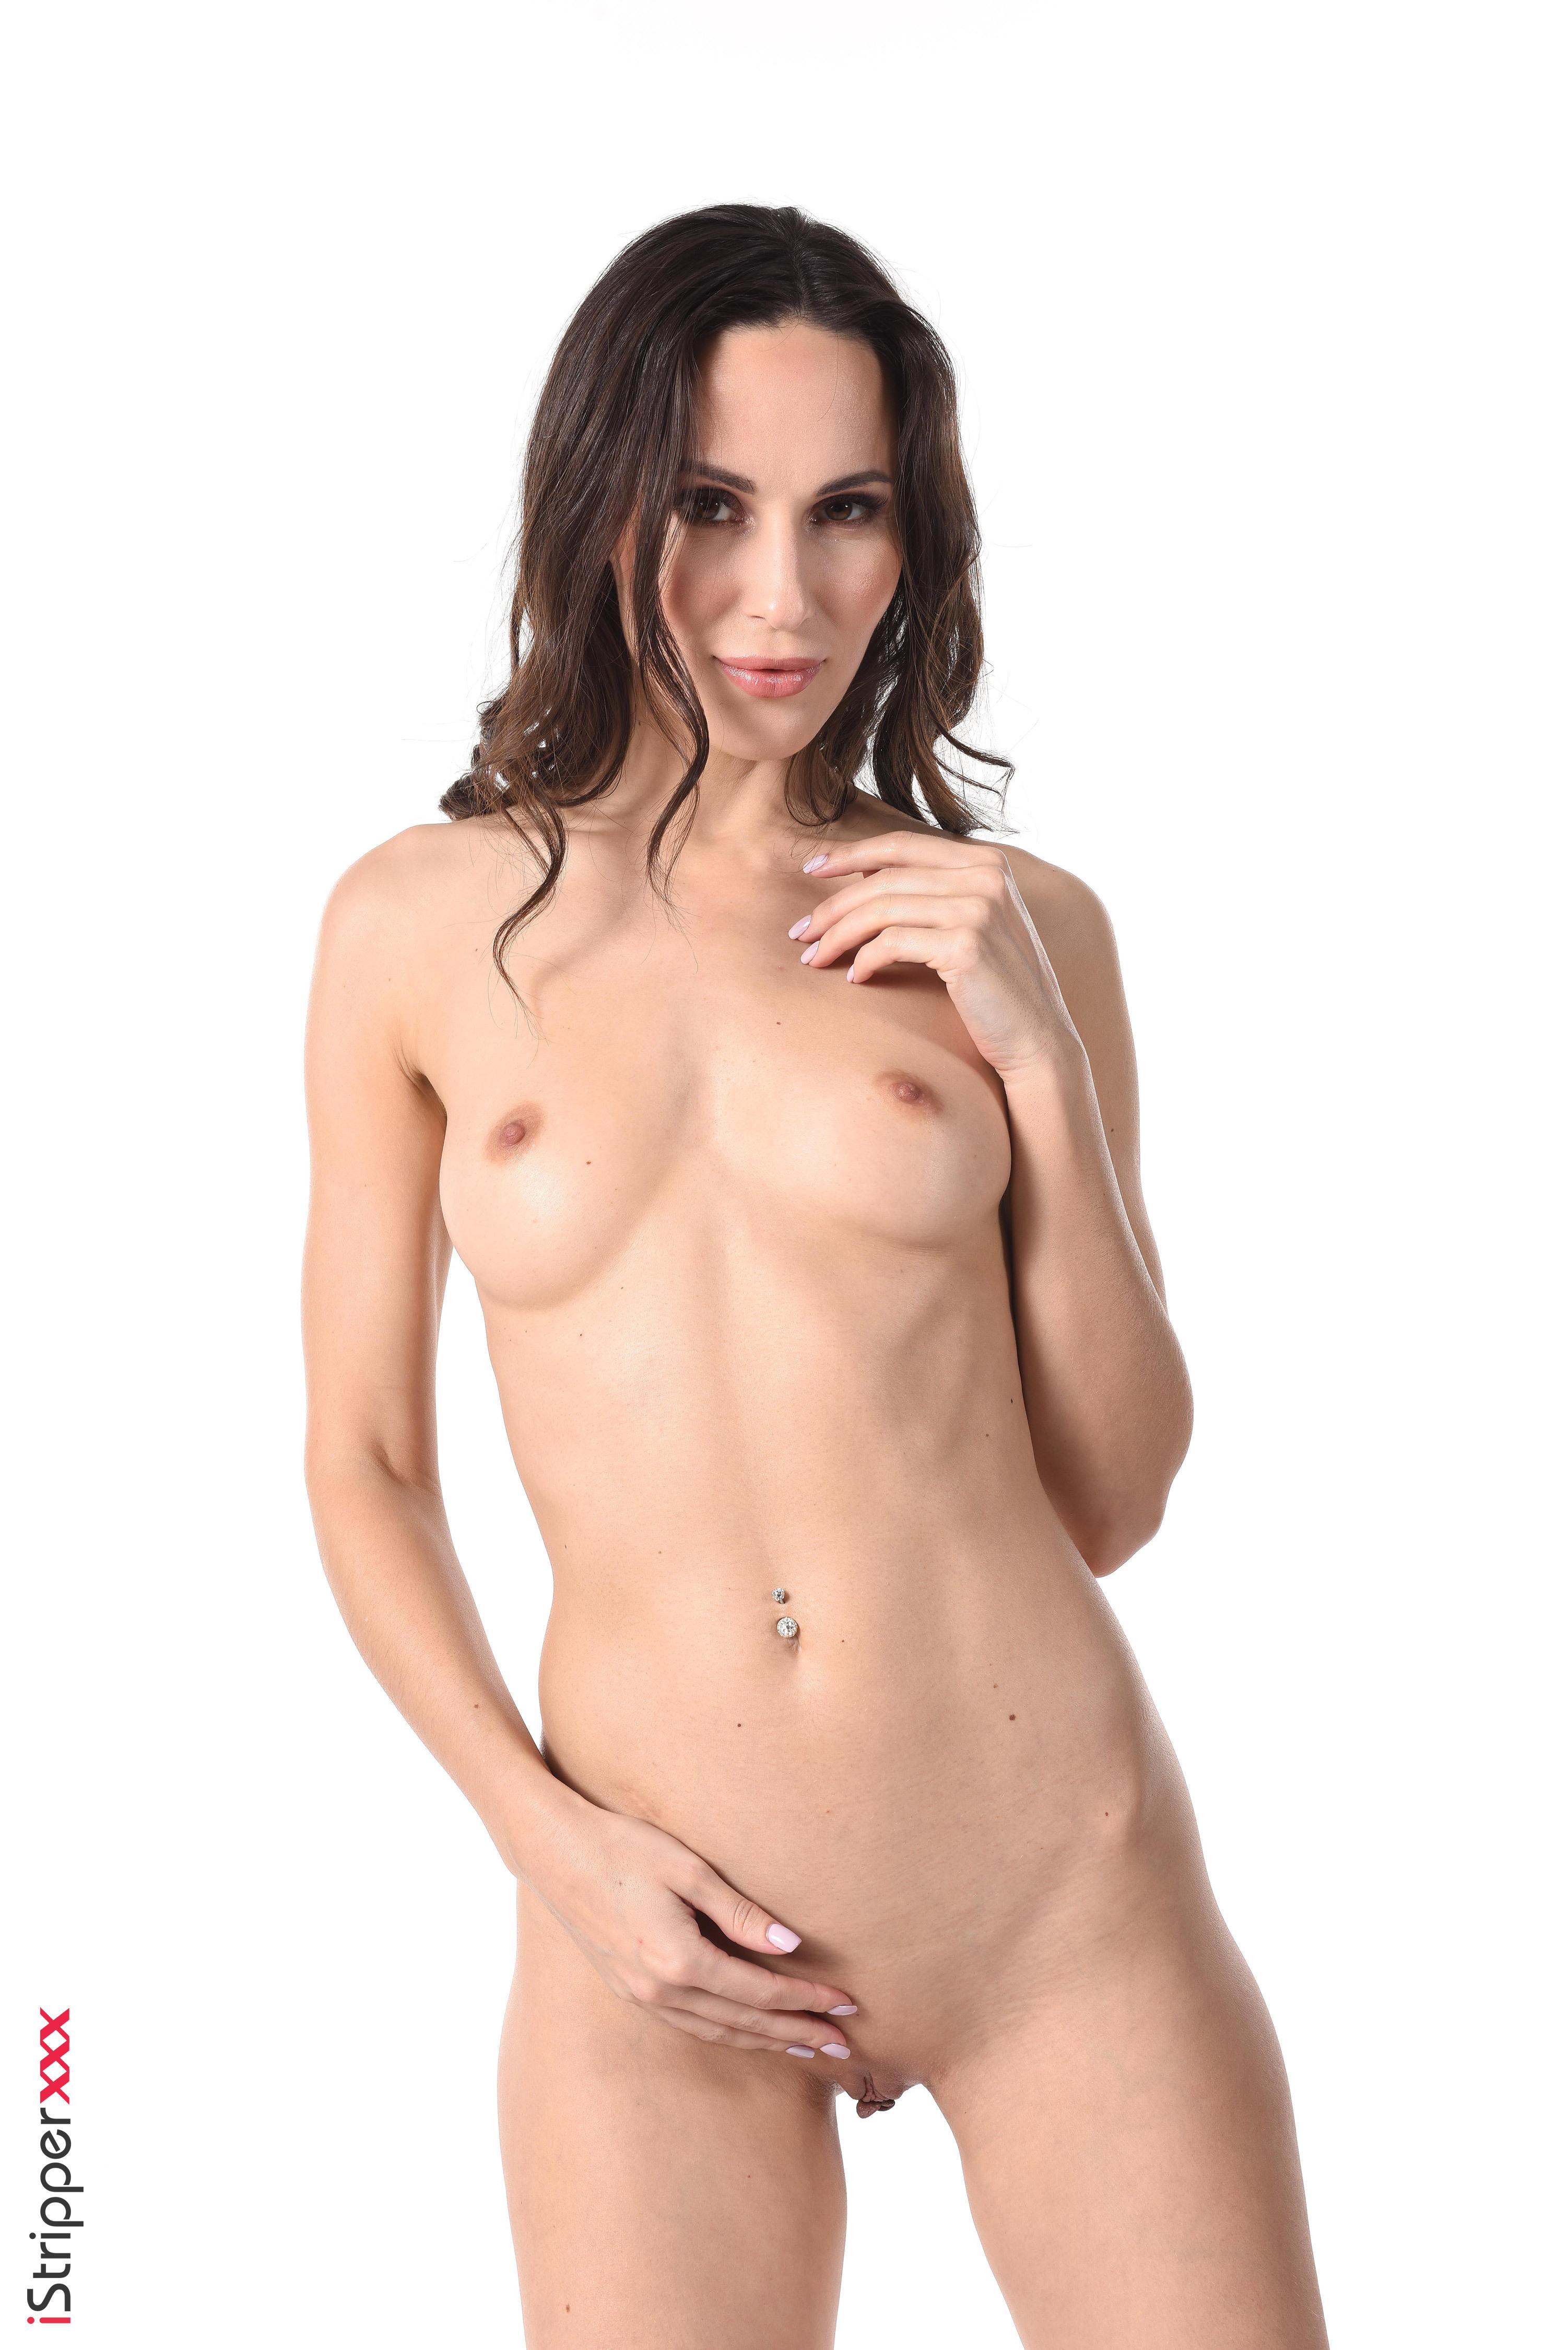 high resolution Porno wallpaper